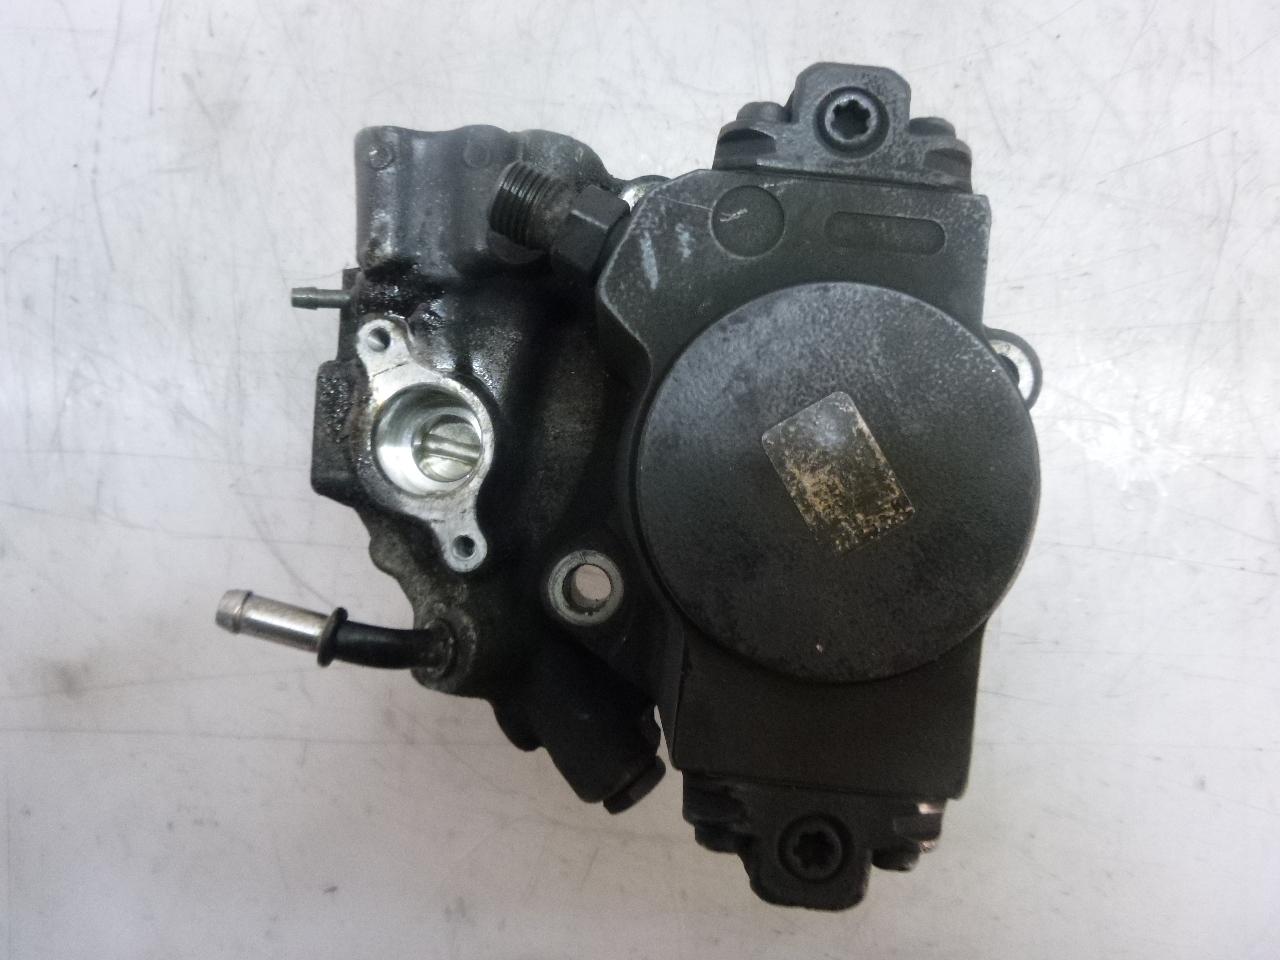 Hochdruckpumpe Defekt 651.911 C207 E250 C220 C250 2,2 CDI Brandschaden